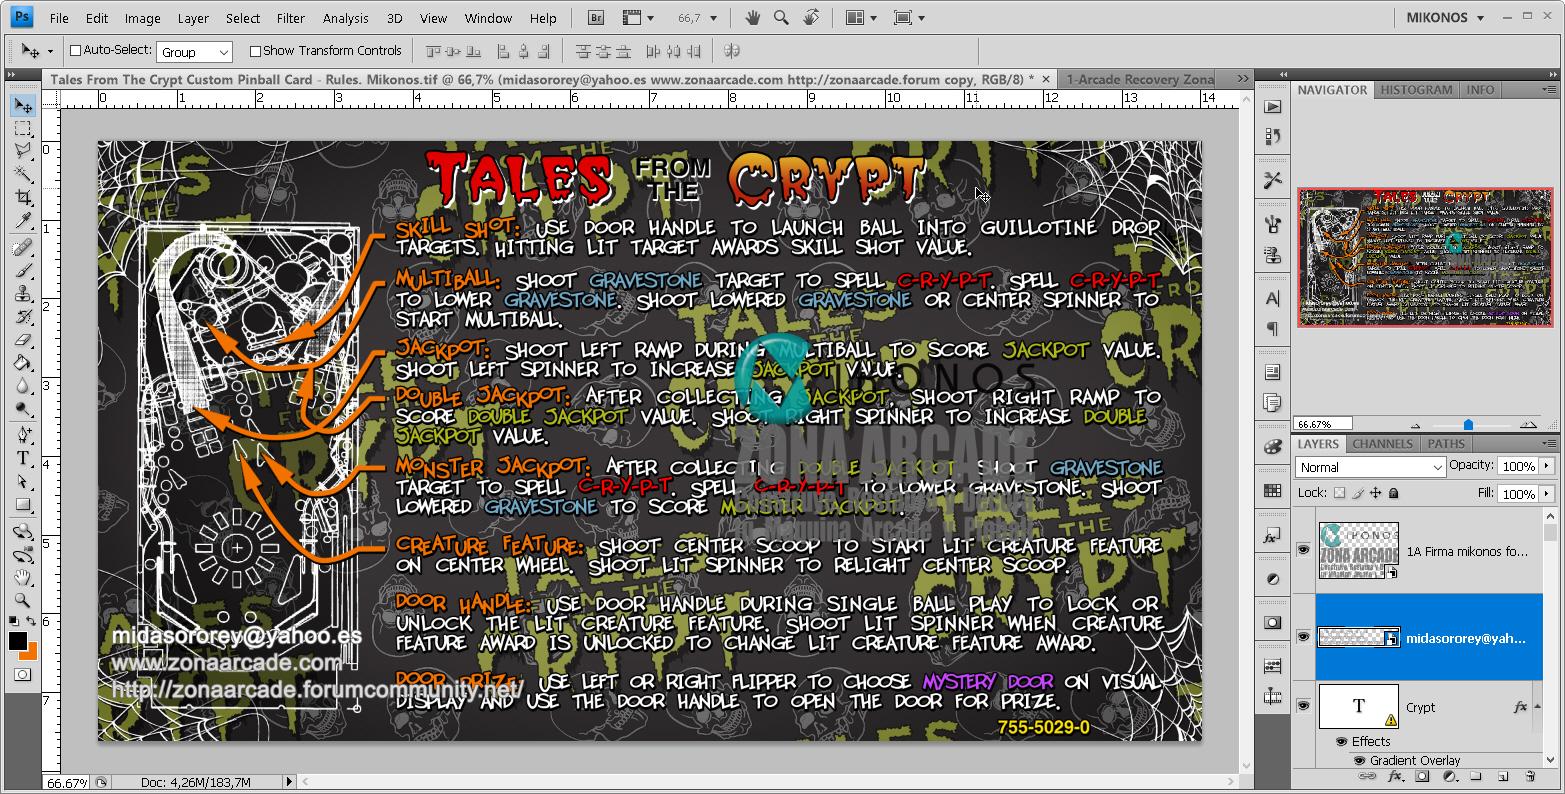 Tales%20From%20The%20Crypt%20Custom%20Pinball%20Card%20-%20Rules.%20Mikonos1.jpg